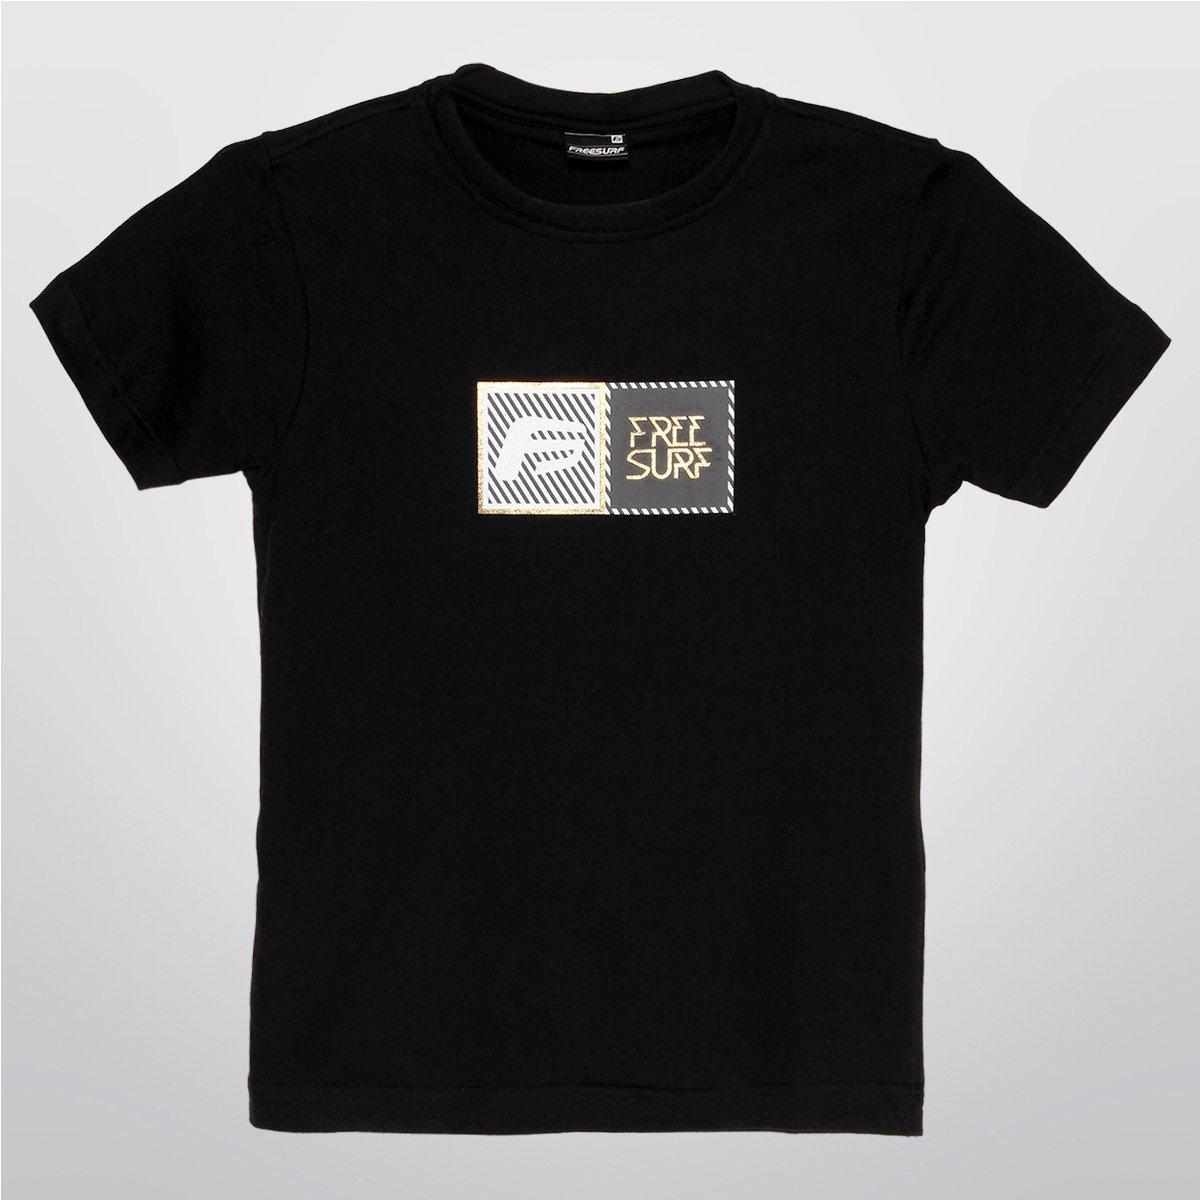 415023666574d Camiseta Free Surf Ship Infantil - Compre Agora   Netshoes